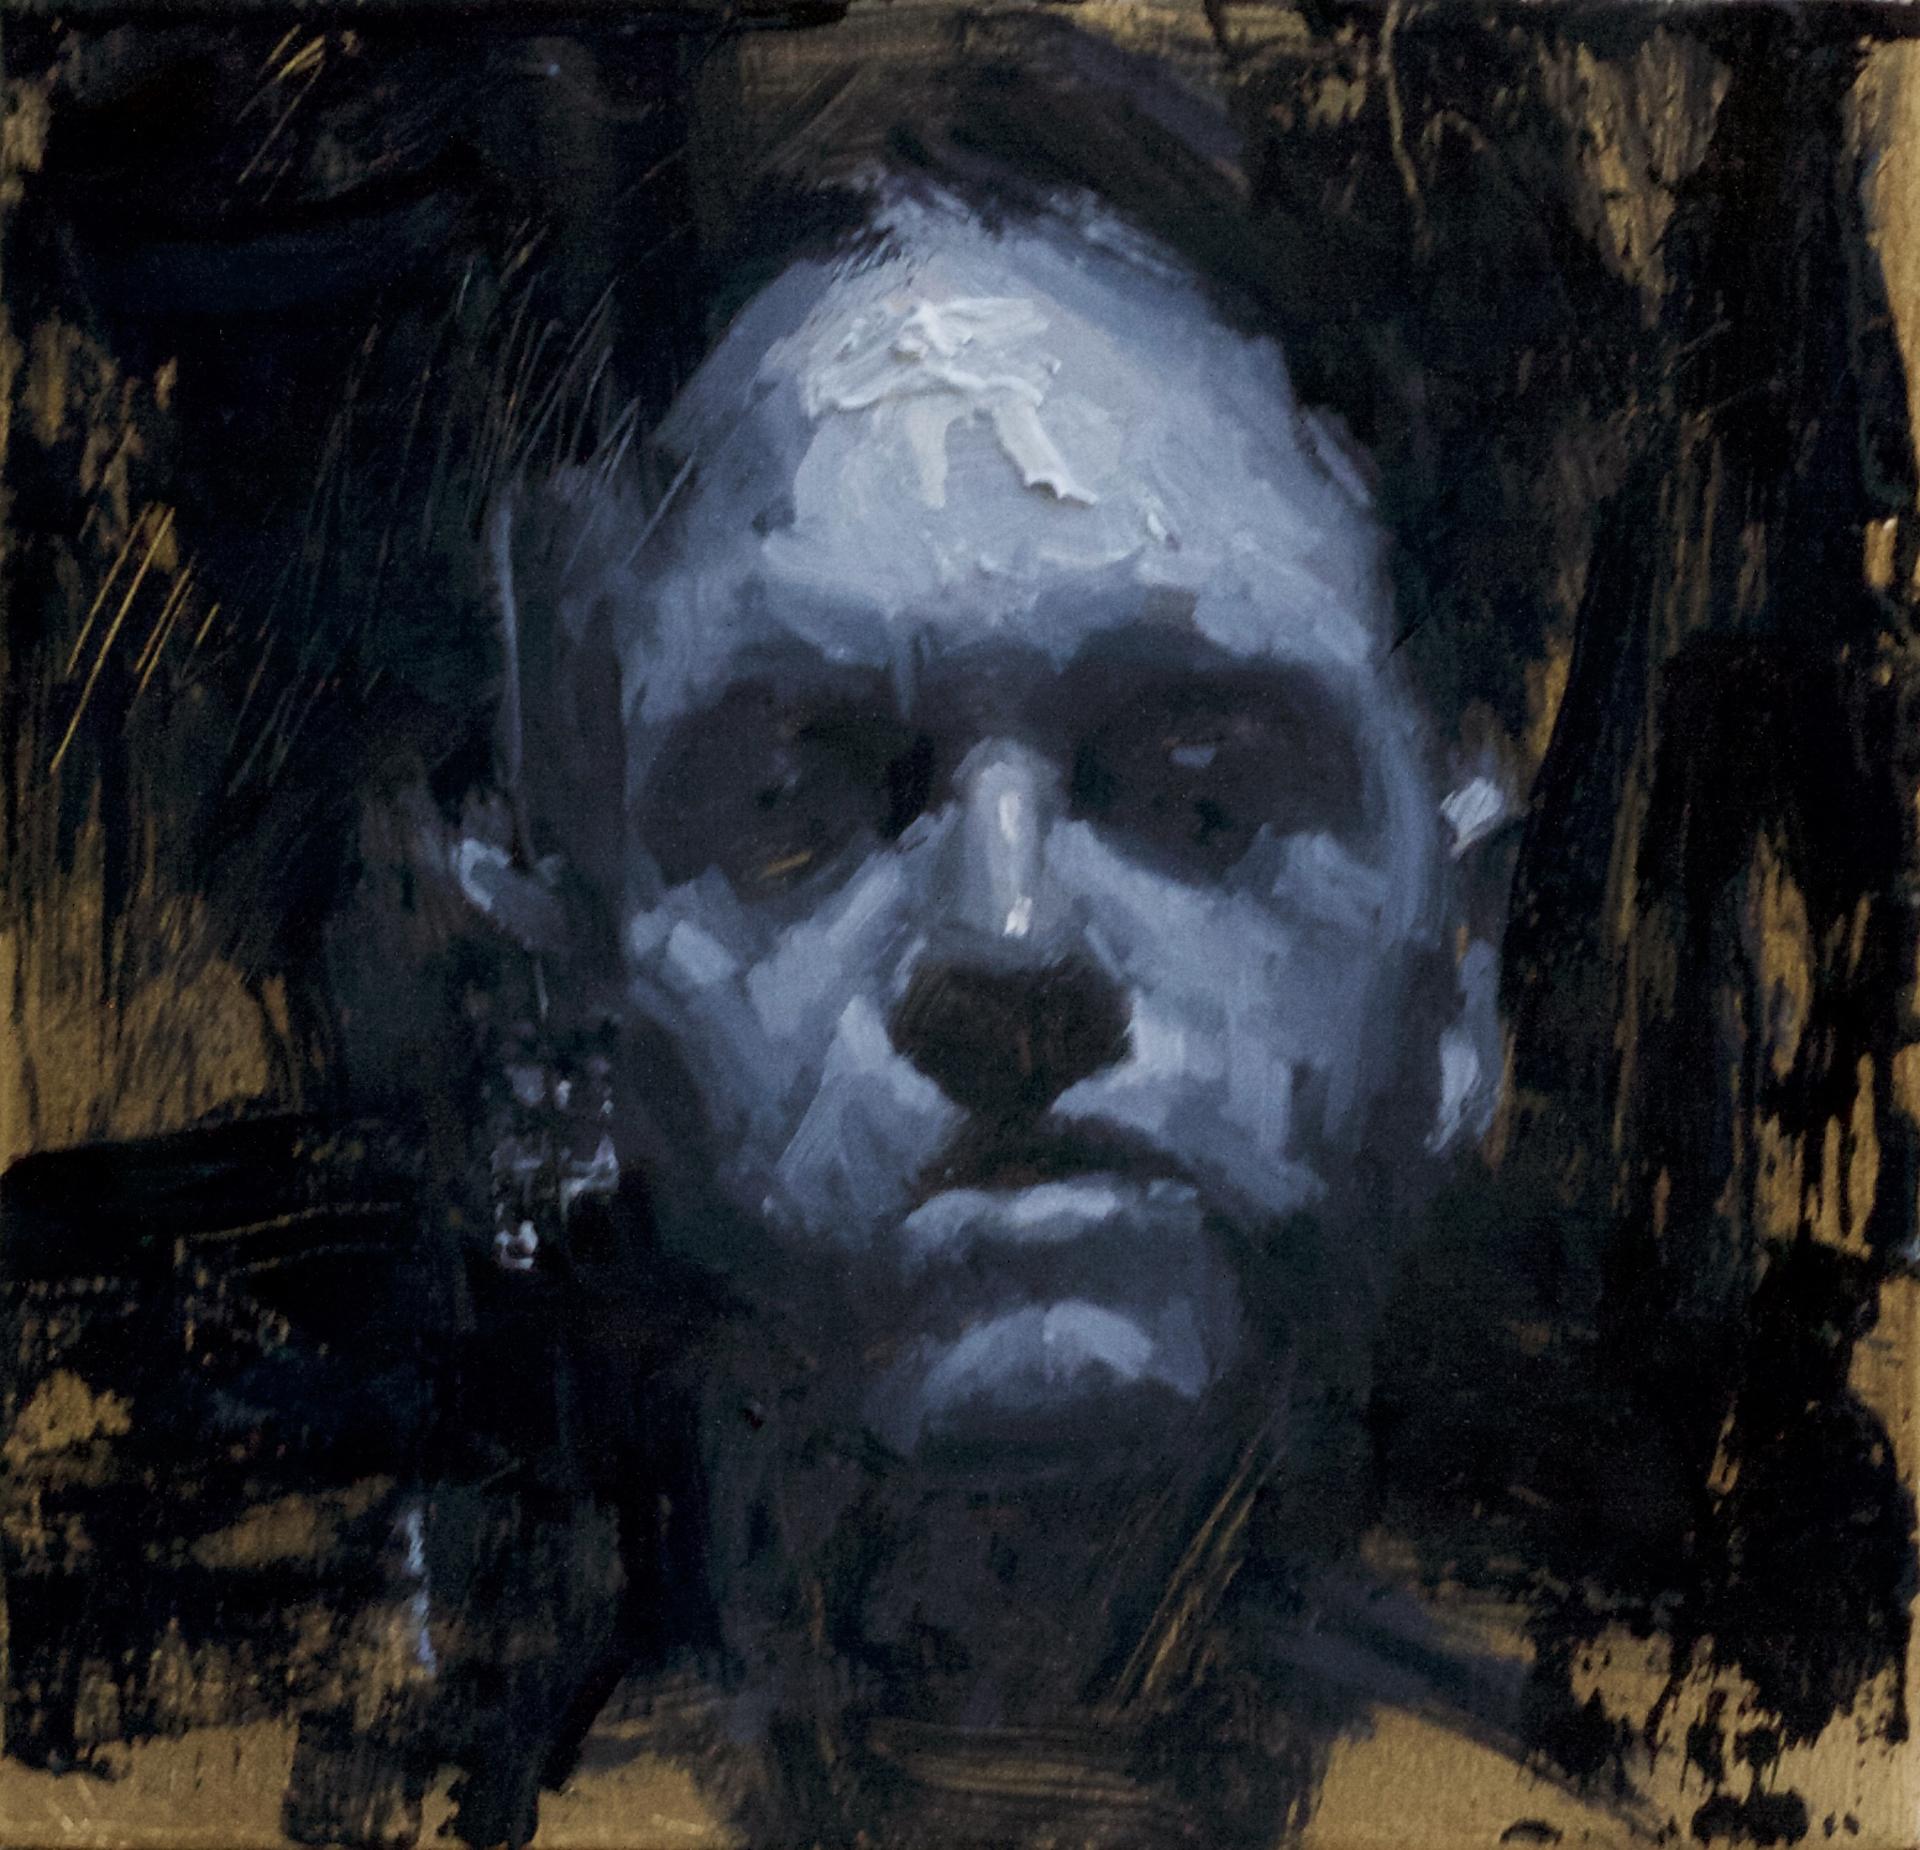 Jason by John Wentz